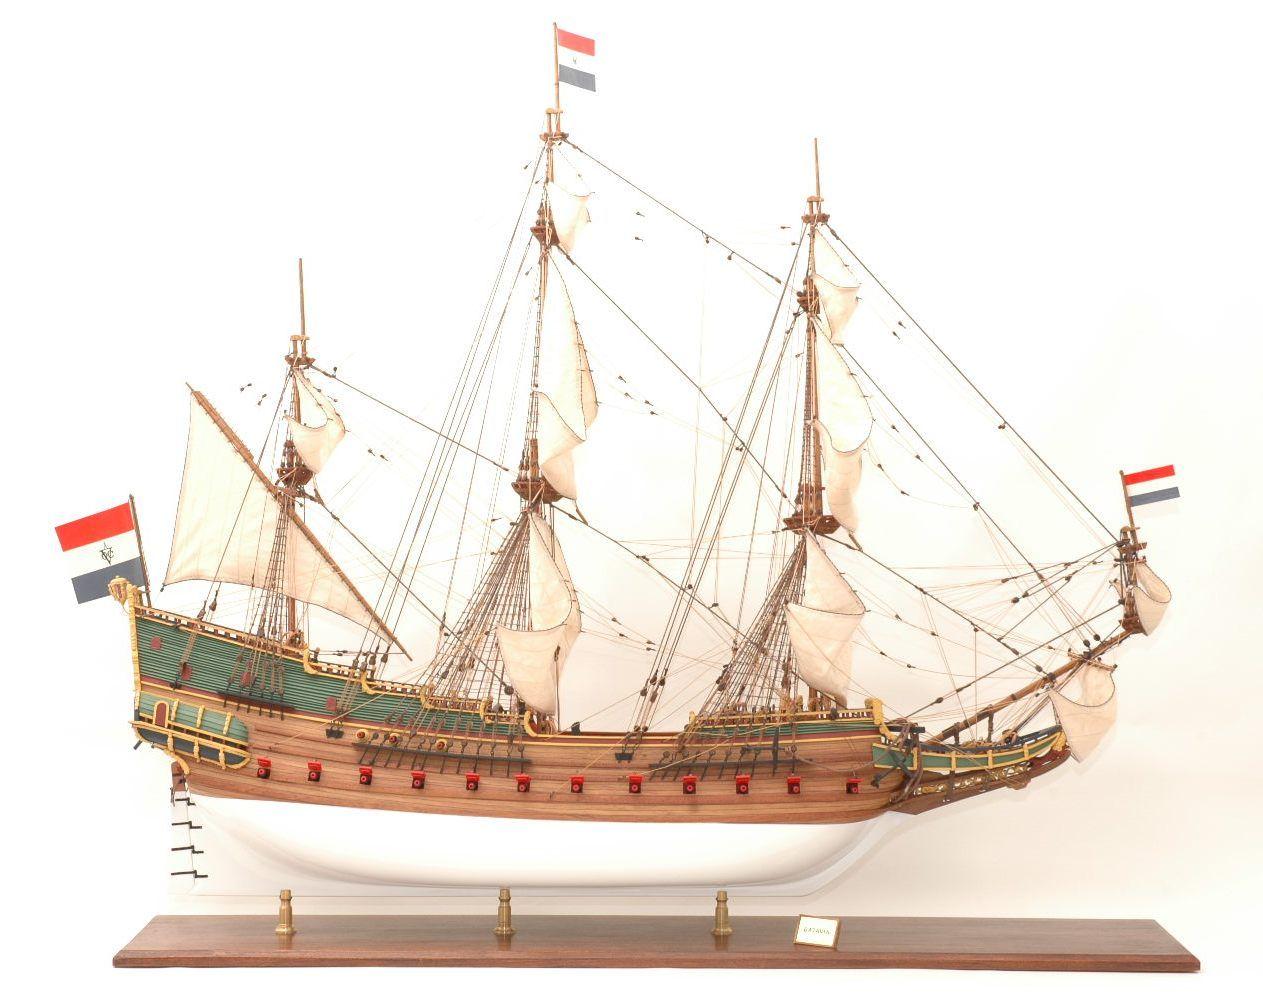 228-6941-Batavia-model-ship-Premier-Range